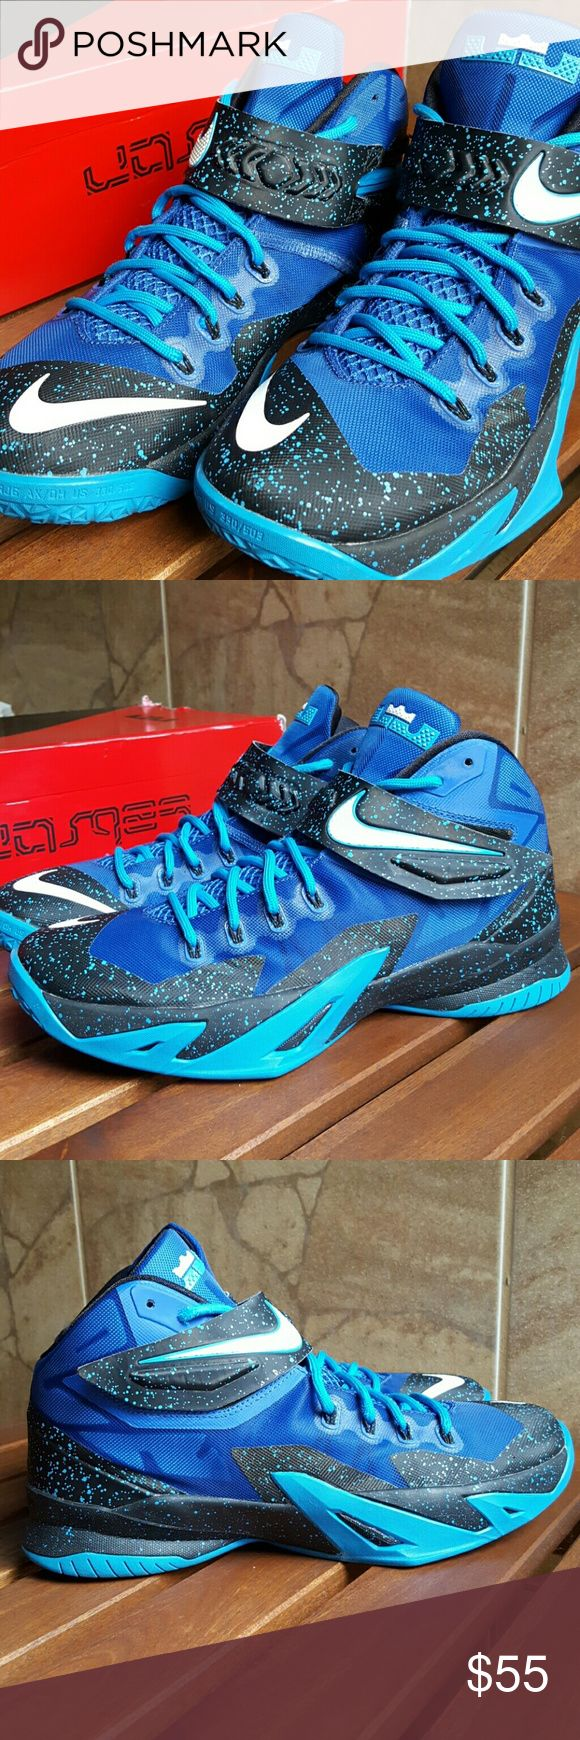 Nike Zoom Soldier VIII LeBron James Original box included Nike Shoes Sneakers